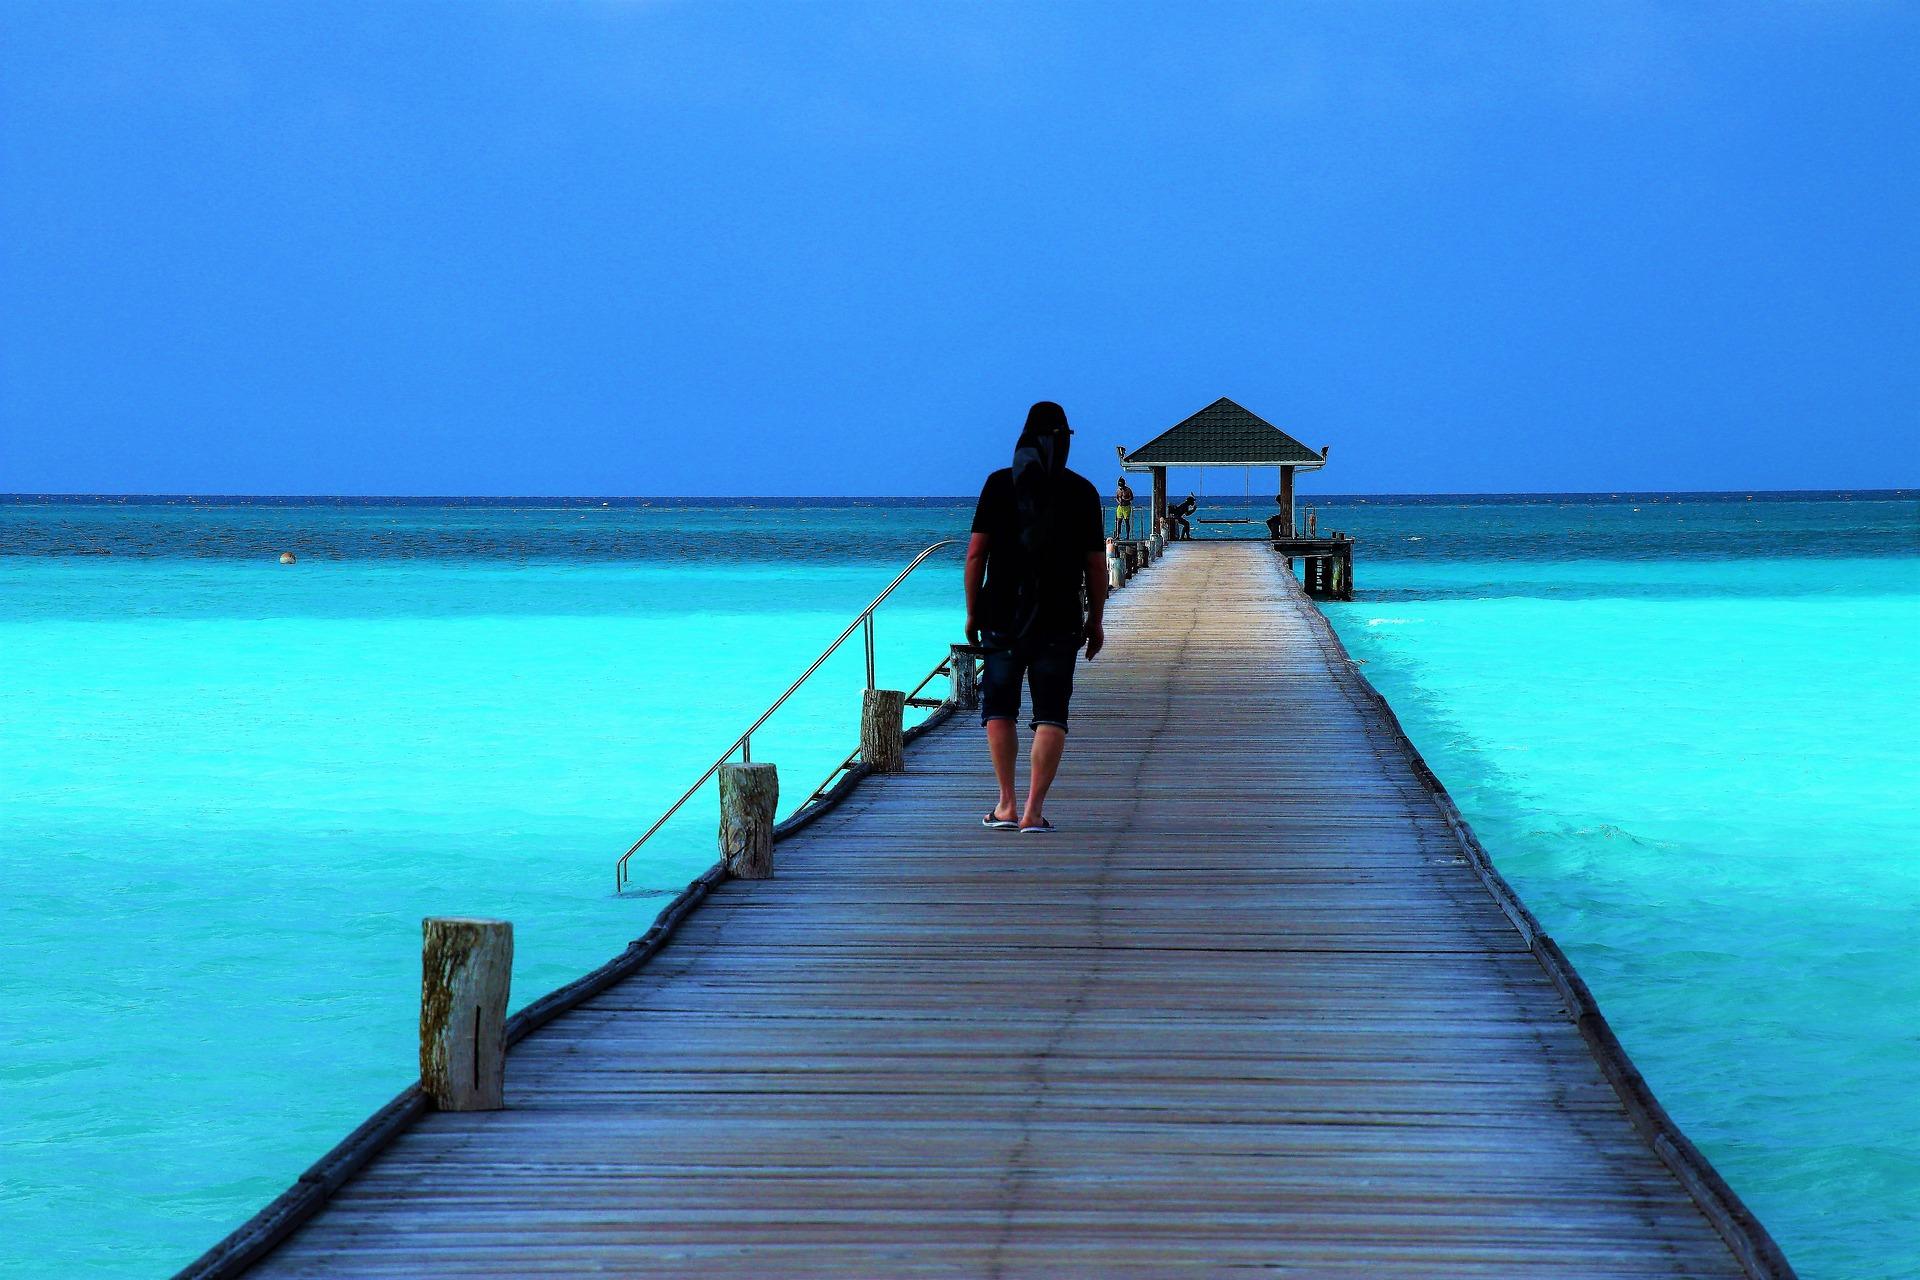 maldives-3220681_1920